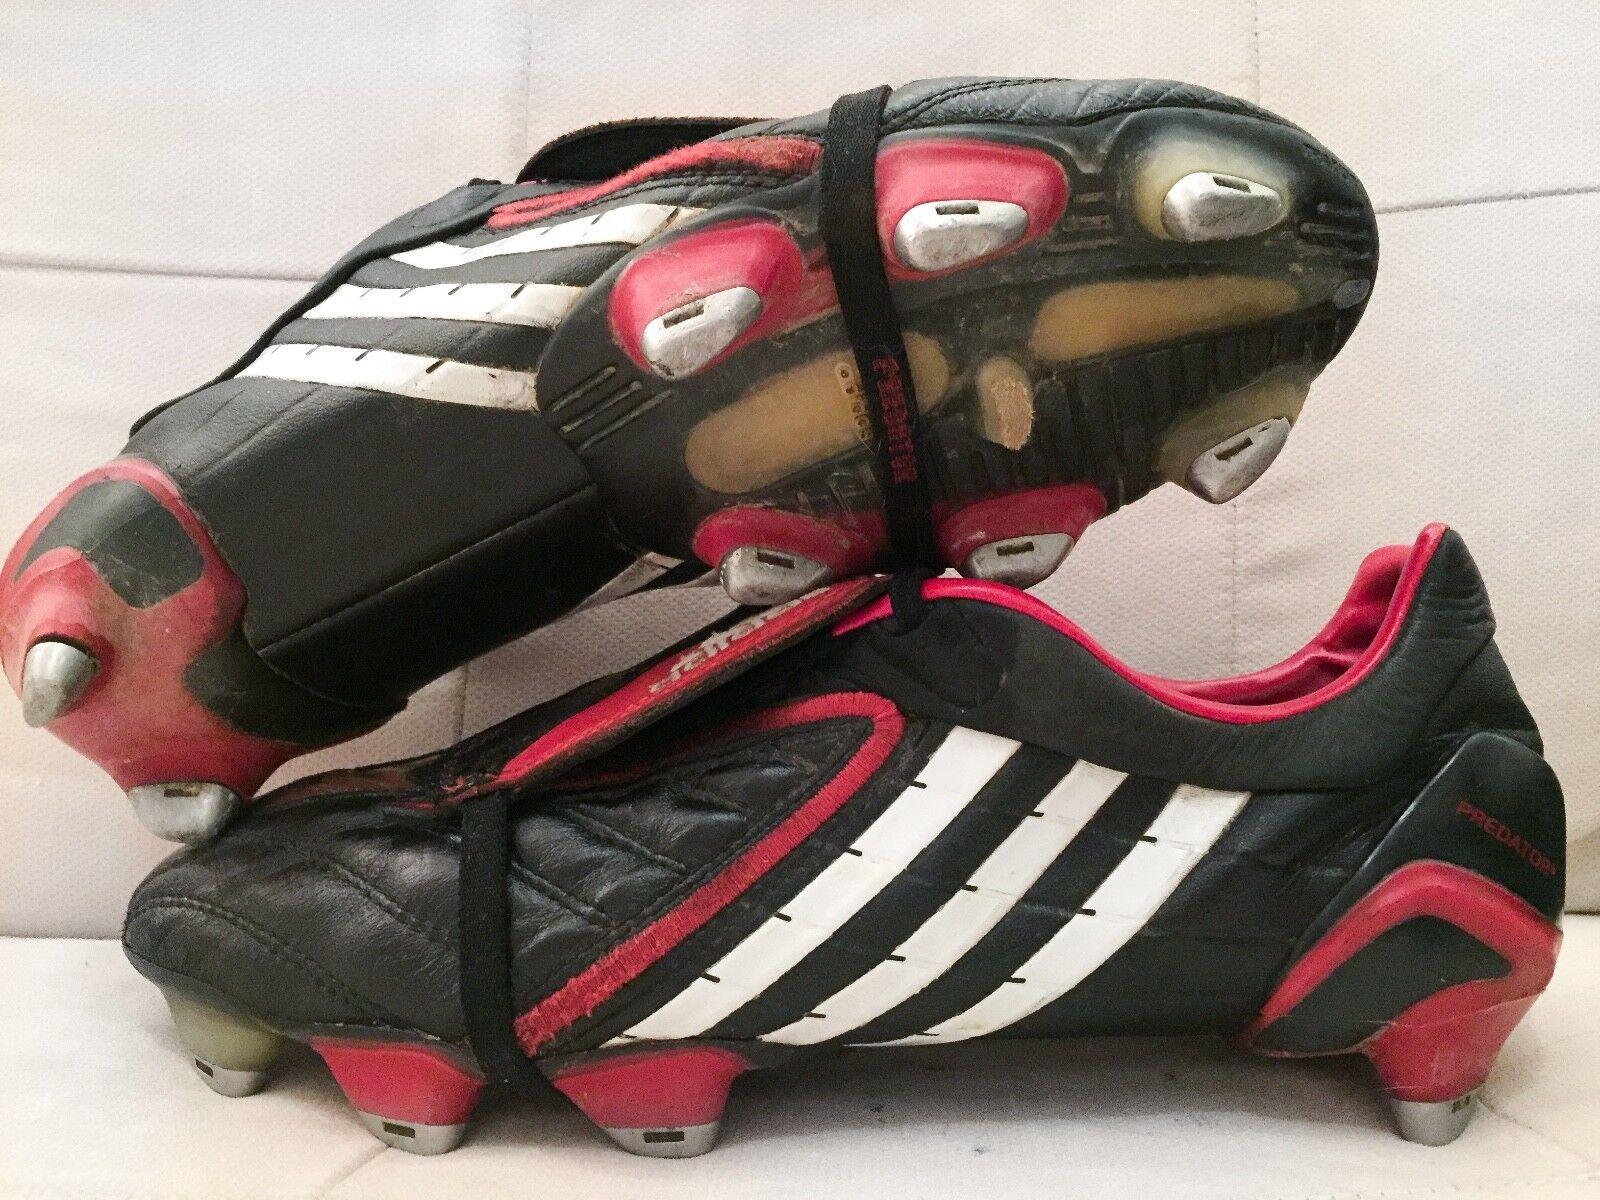 Adidas Projoator Powerswerve manía SG Botines De Fútbol botas US9.5